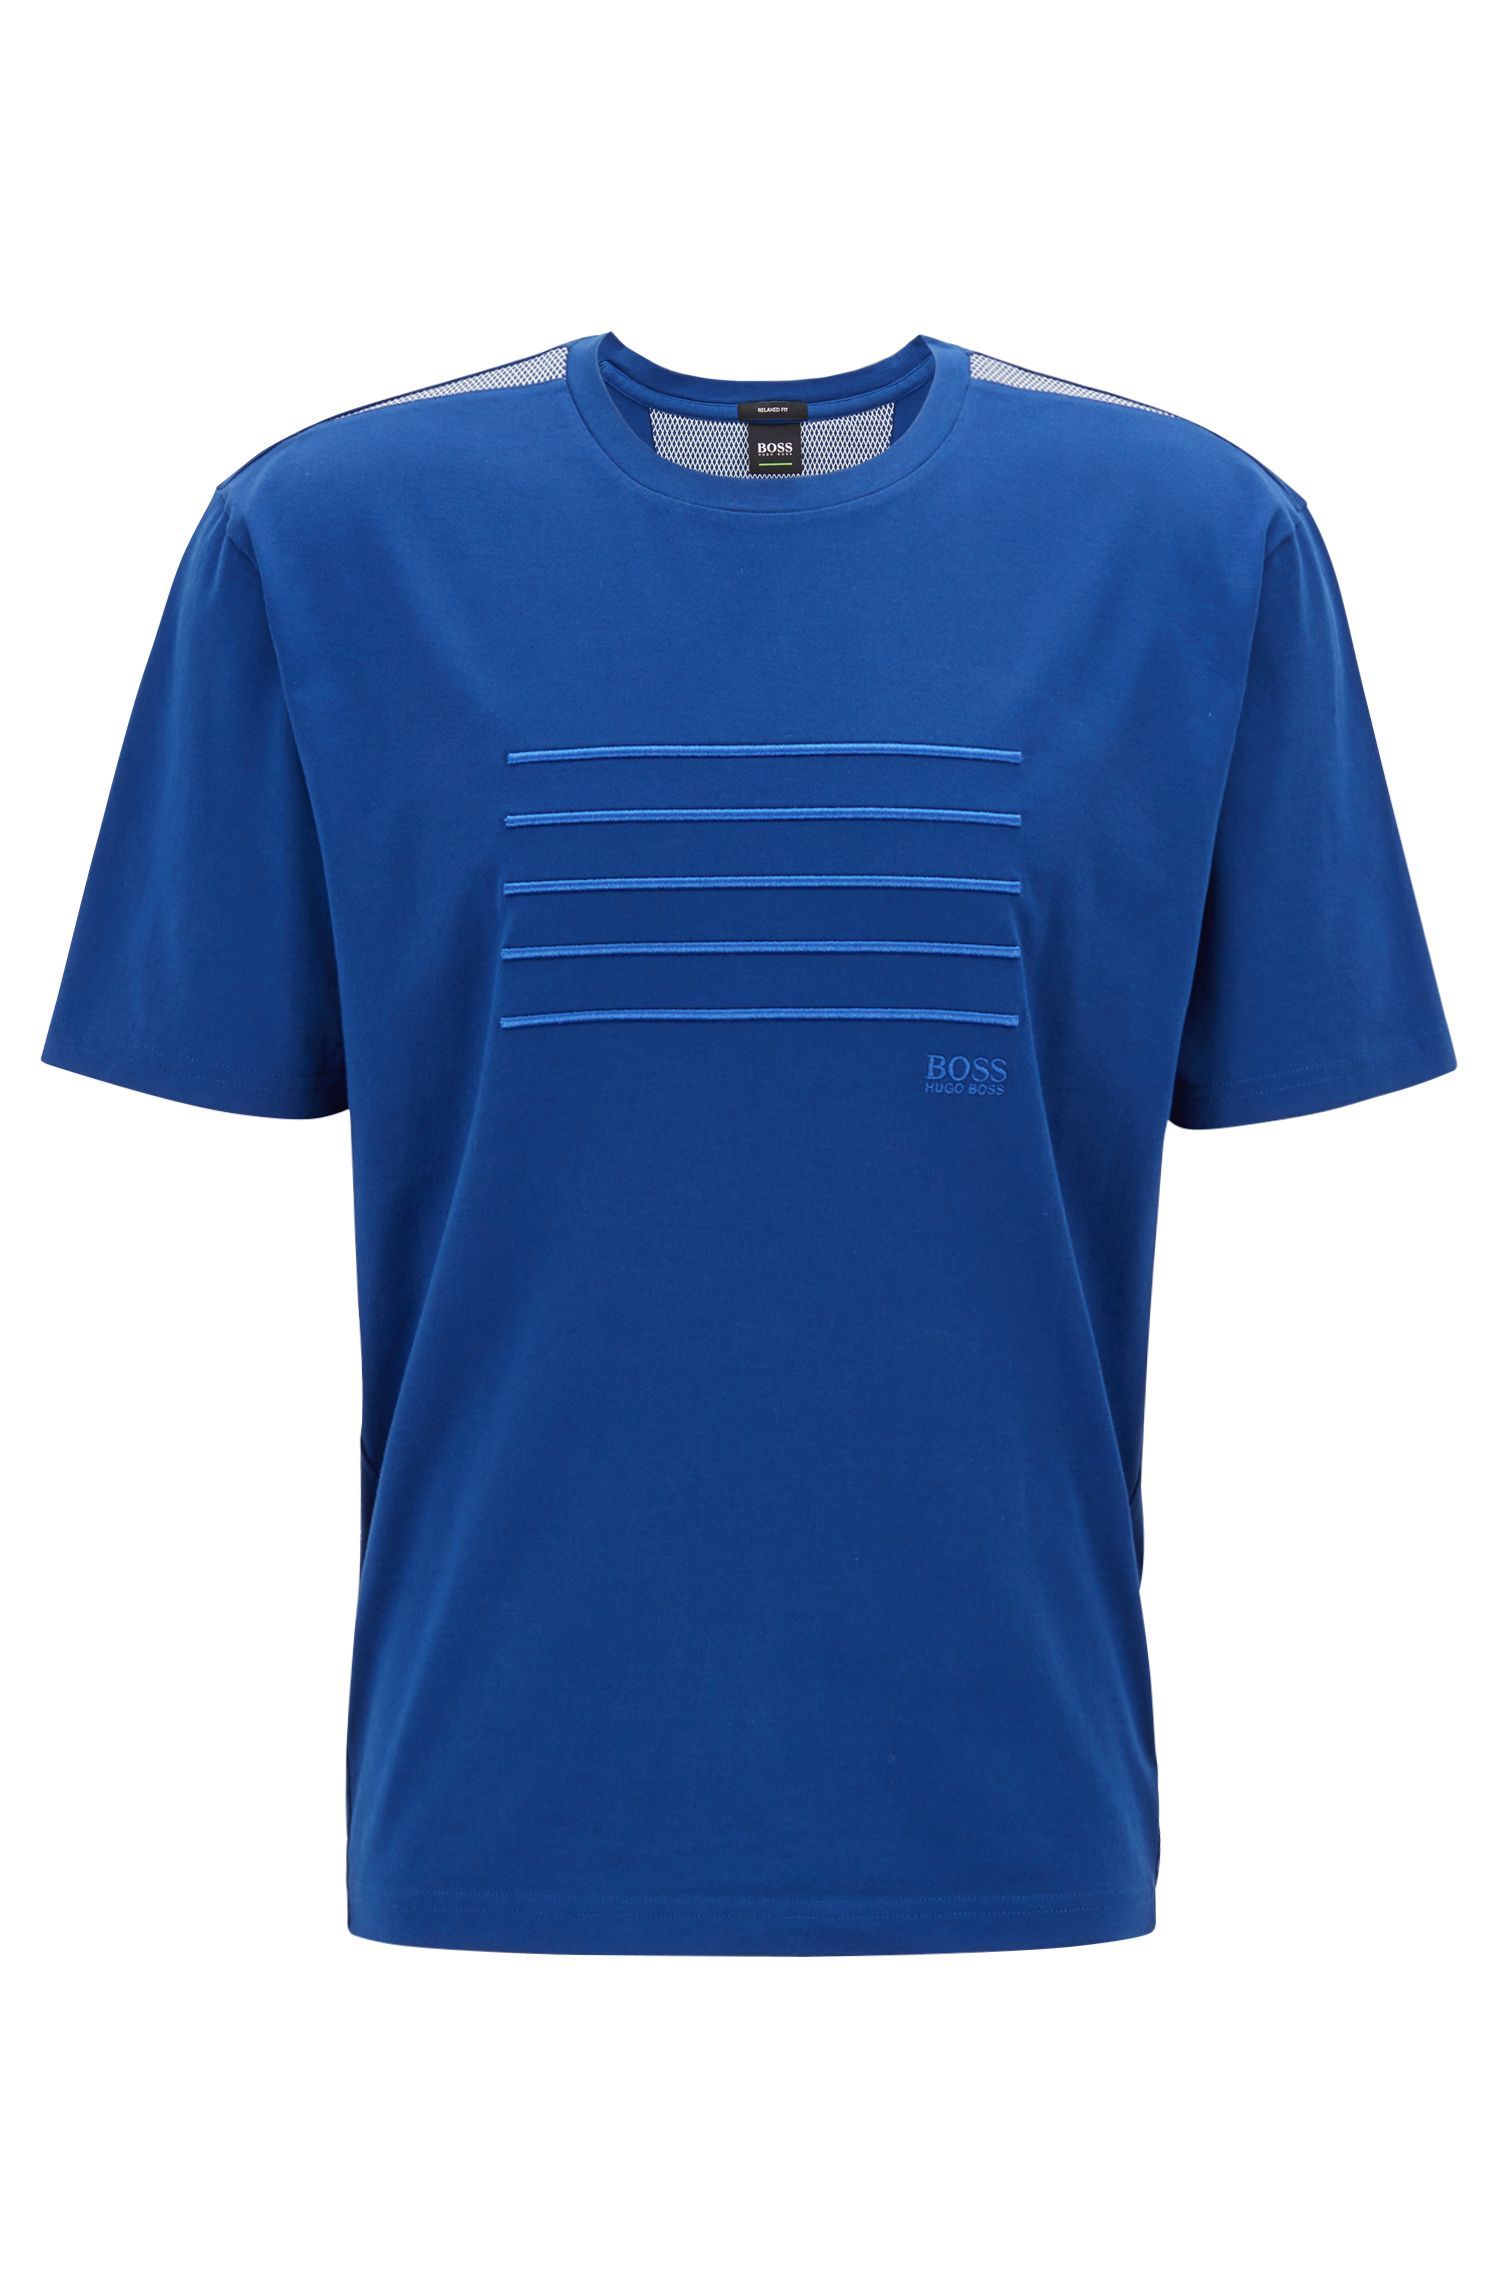 T-shirt Relaxed Fit avec rayures brodées, Bleu